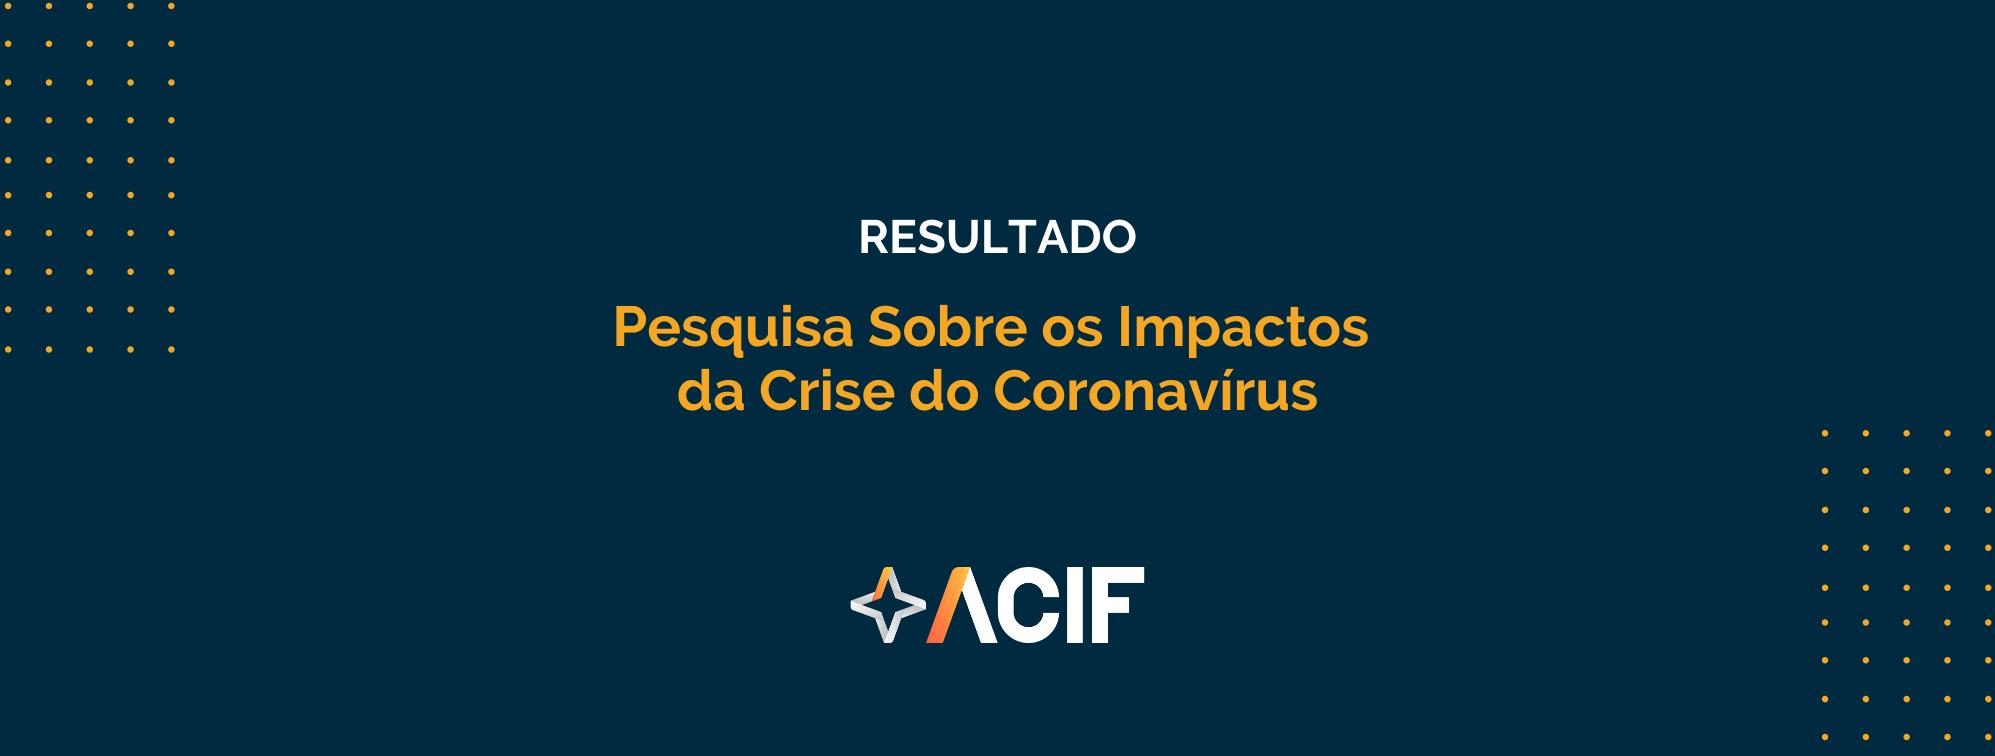 1ª pesquisa sobre os impactos da crise do coronavírus